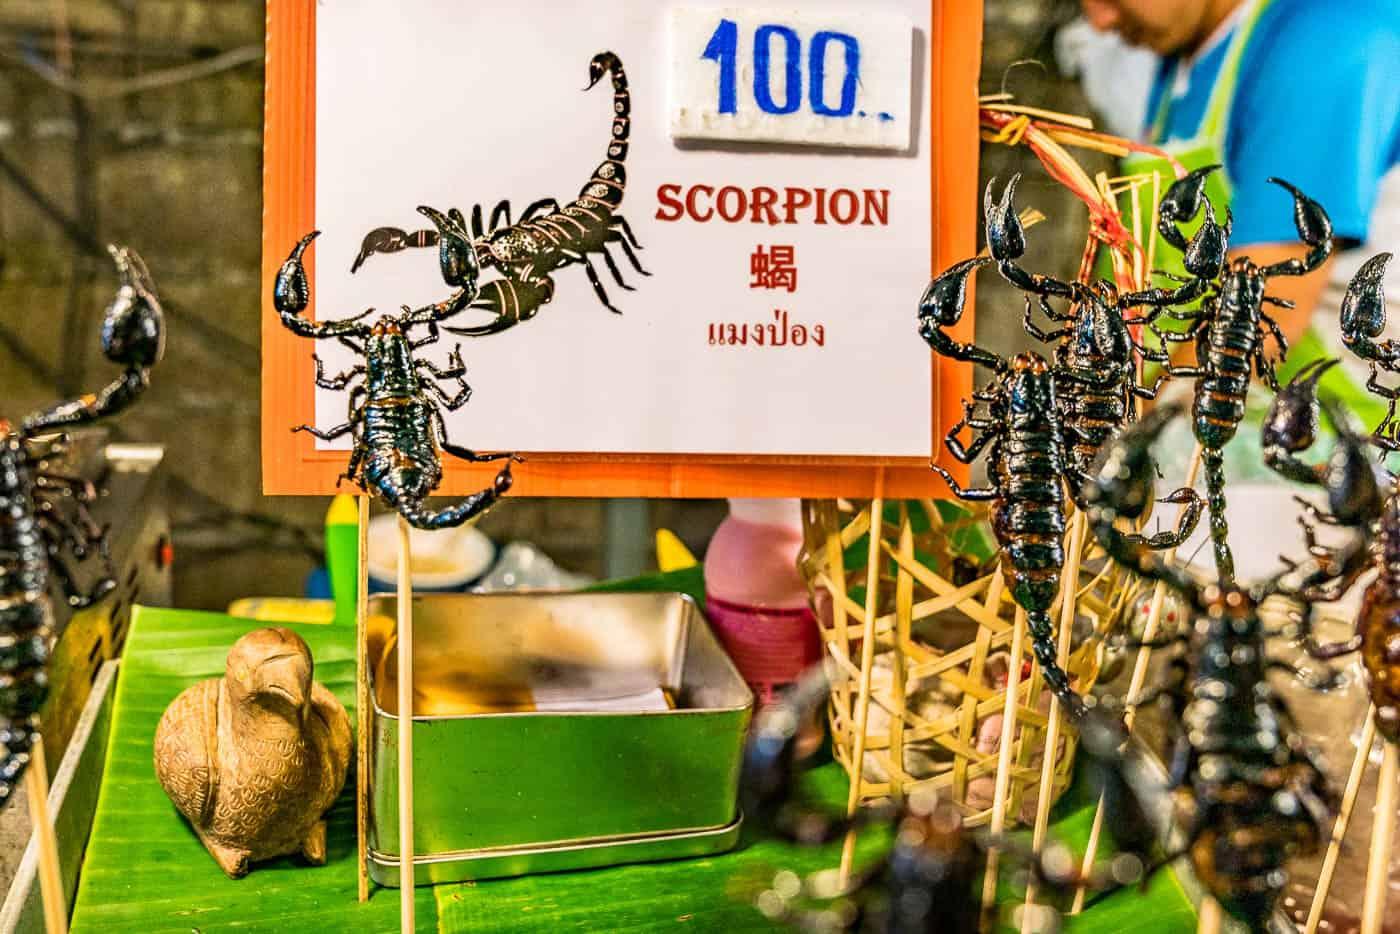 street food chiang mai scorpion